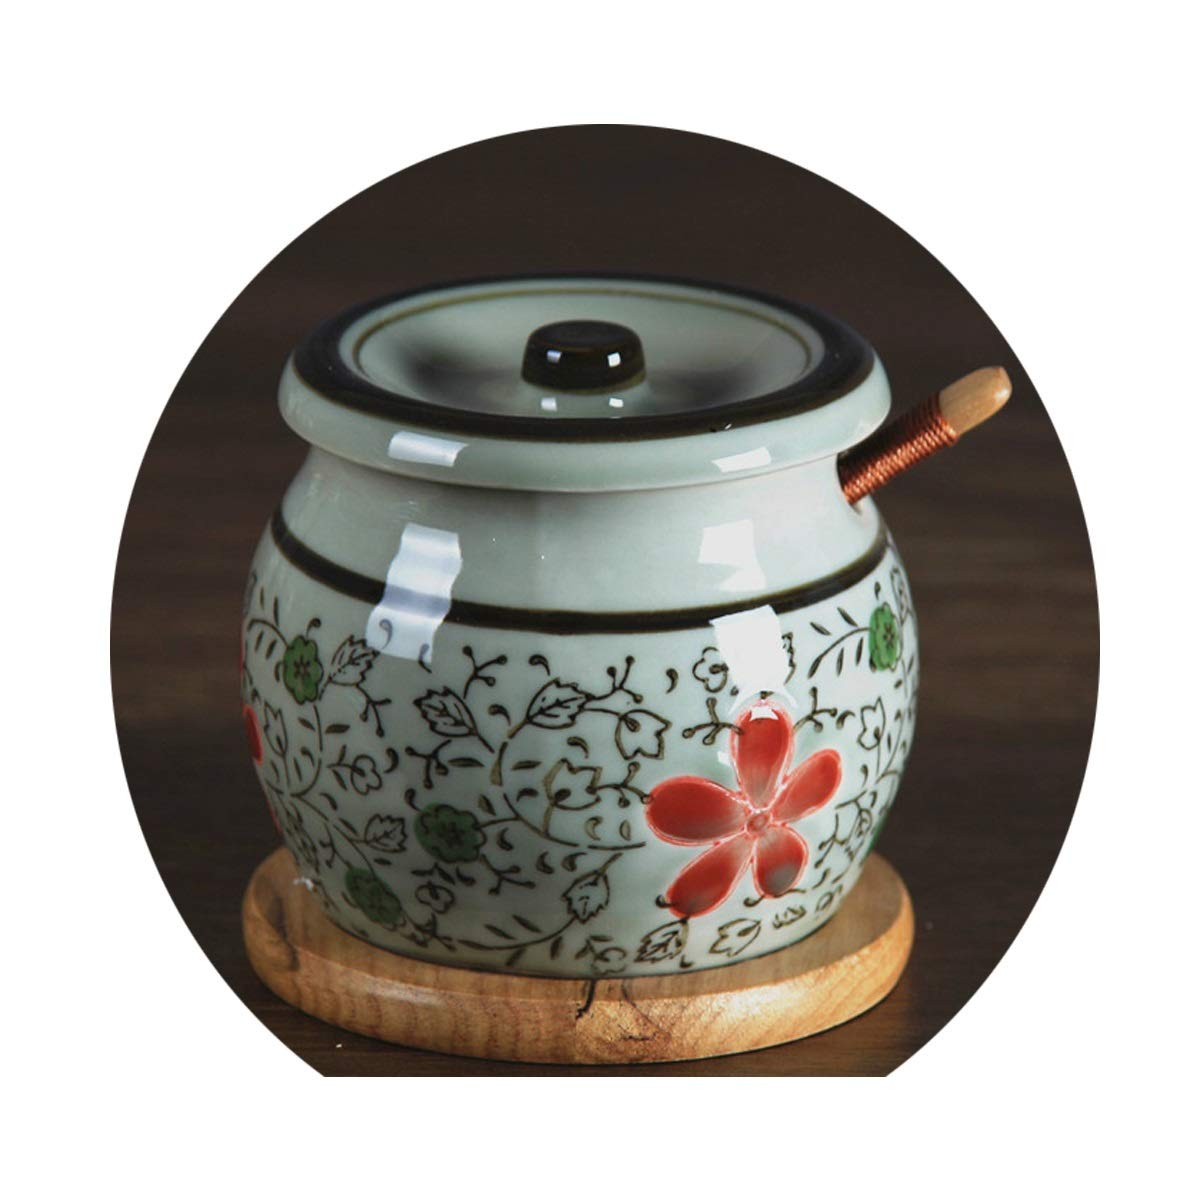 MINGRUIGONGMAO Condiment Box, Underglaze Color Salt Can, Oil Tank, Kitchen Seasoning Jar, Seasoning Jar, Ceramic Chili Jar, Small, Large Plush toys (Color : D, Size : Small) by MINGRUIGONGMAO